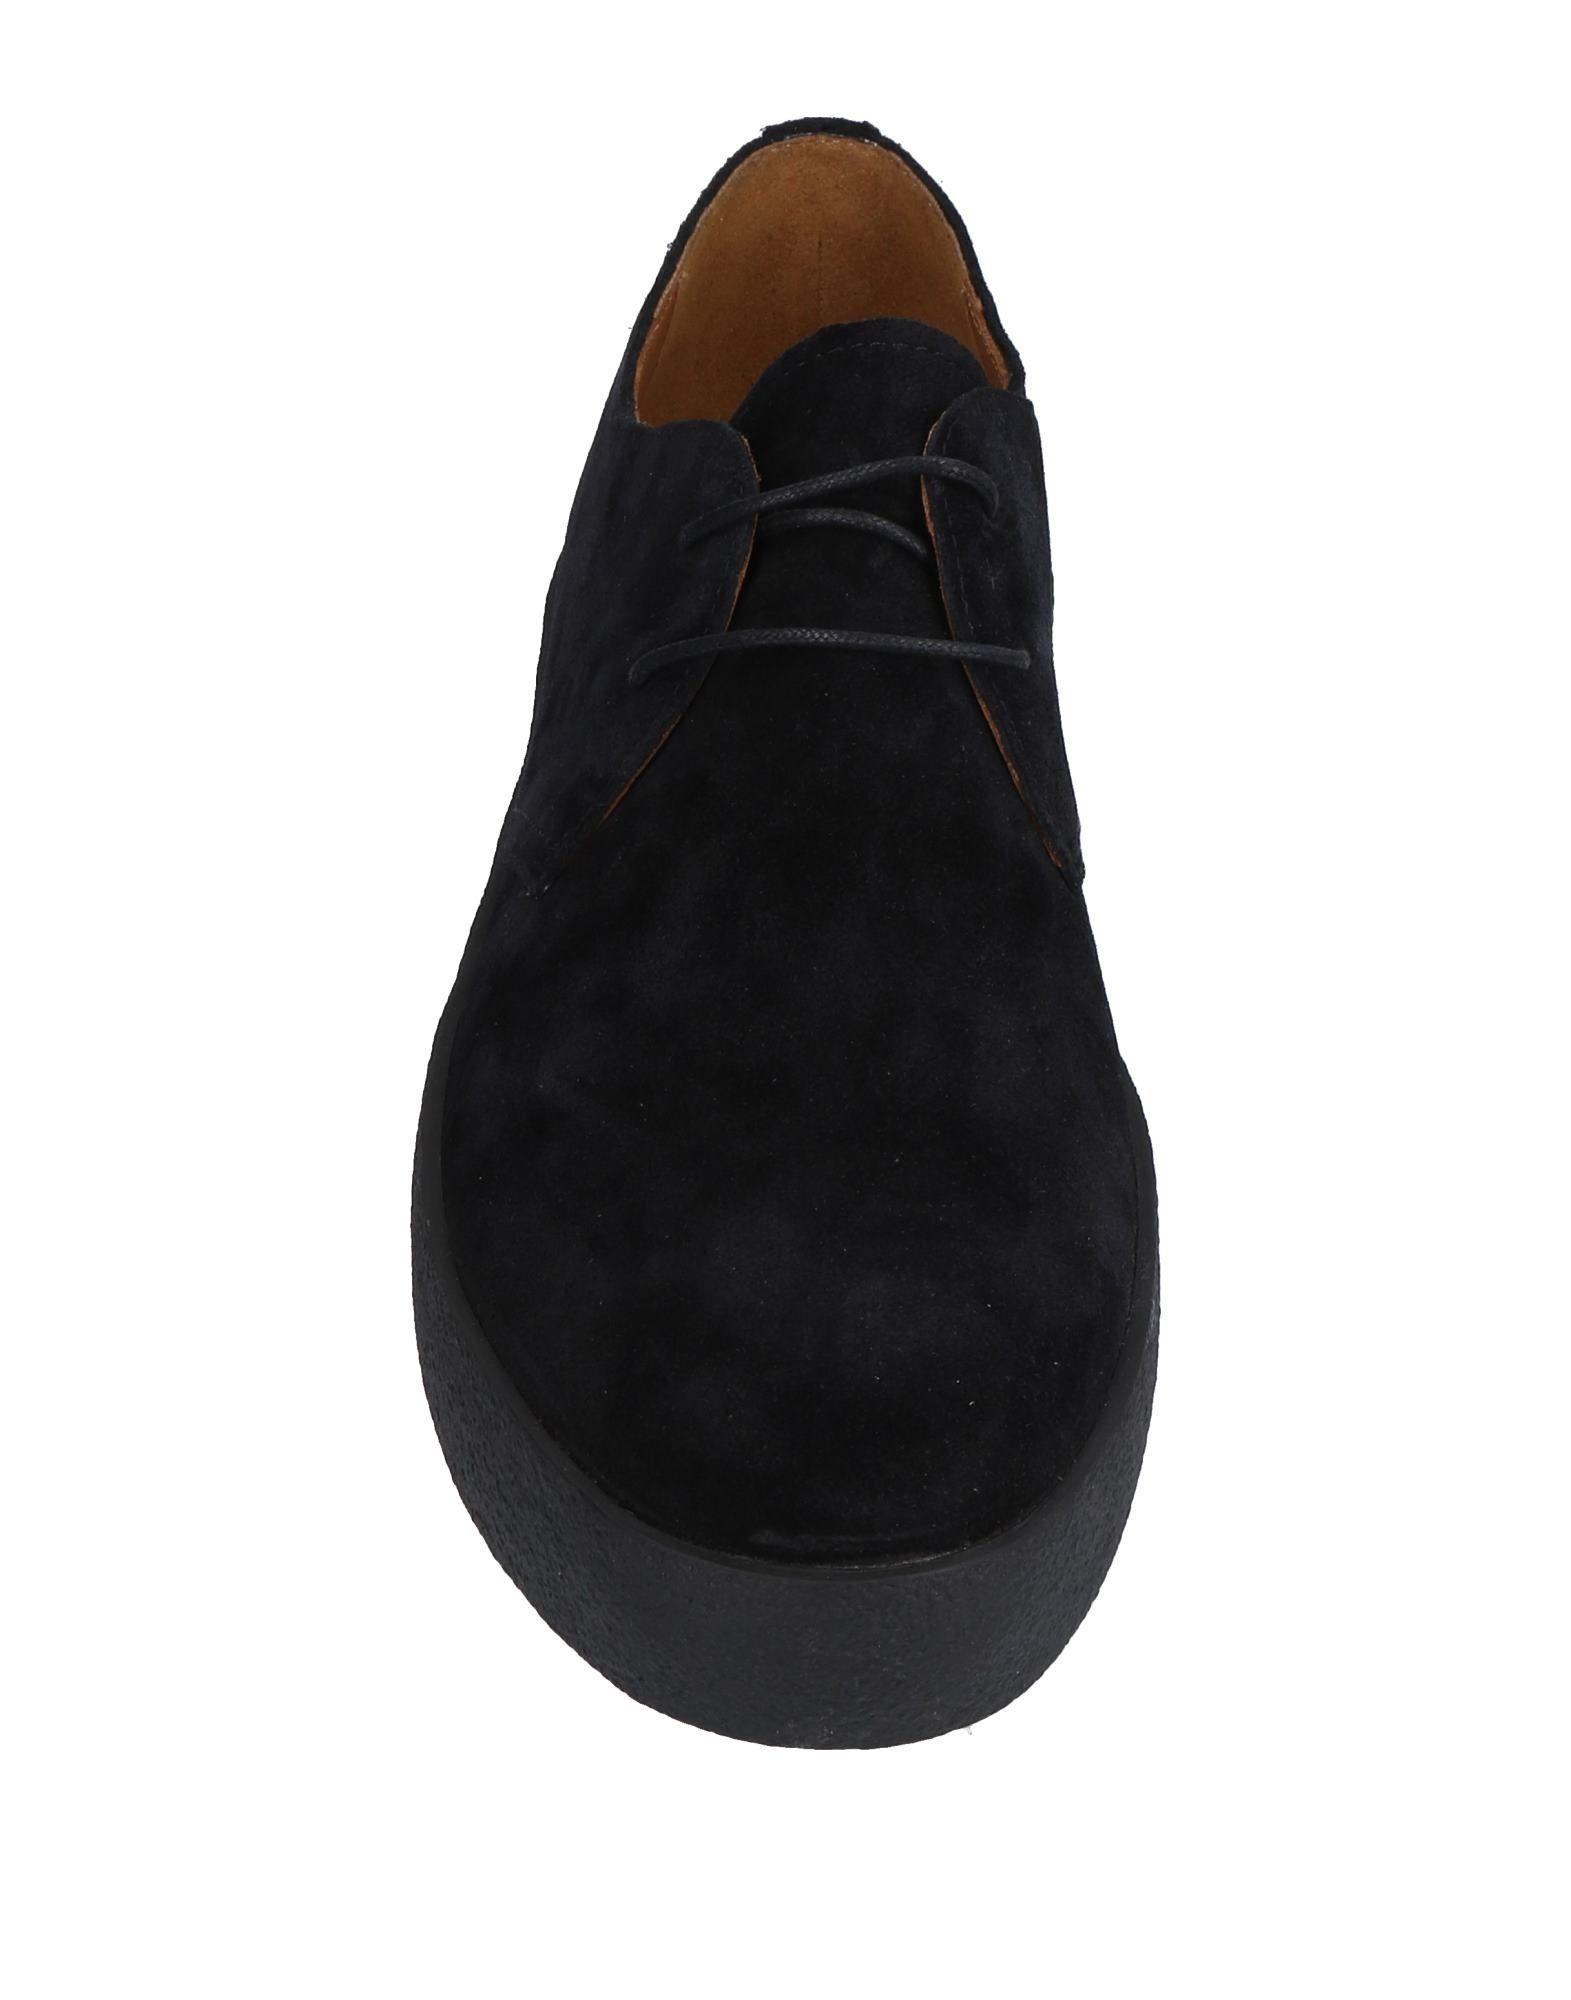 Stringate Stringate Stringate Vagabond Shoemakers Uomo - 11512982SX e2ad5f